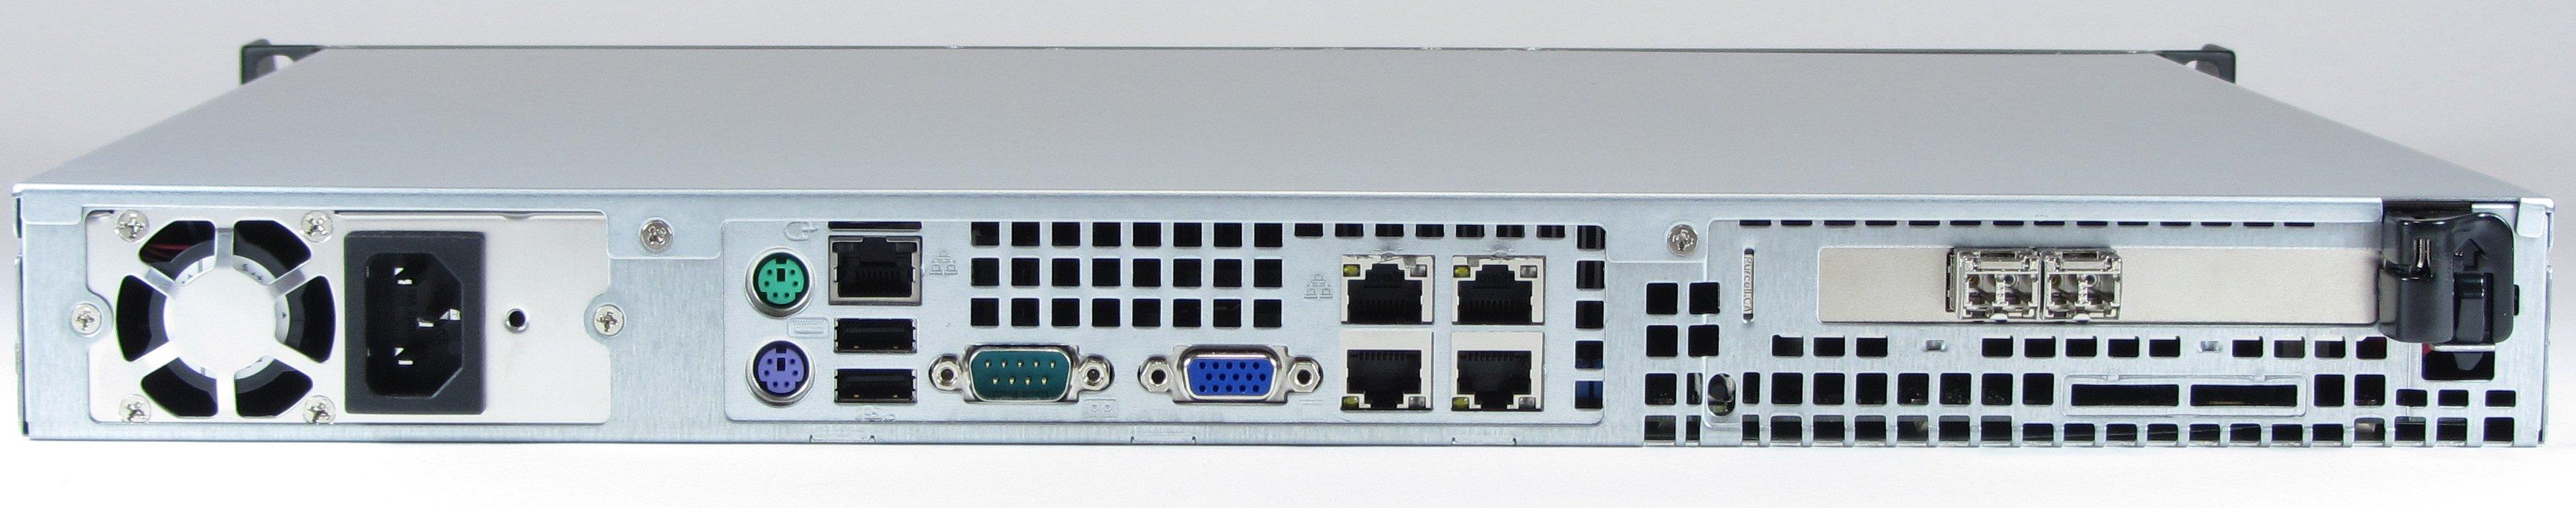 CT503-10G High-Speed LANforge-FIRE Traffic Generator